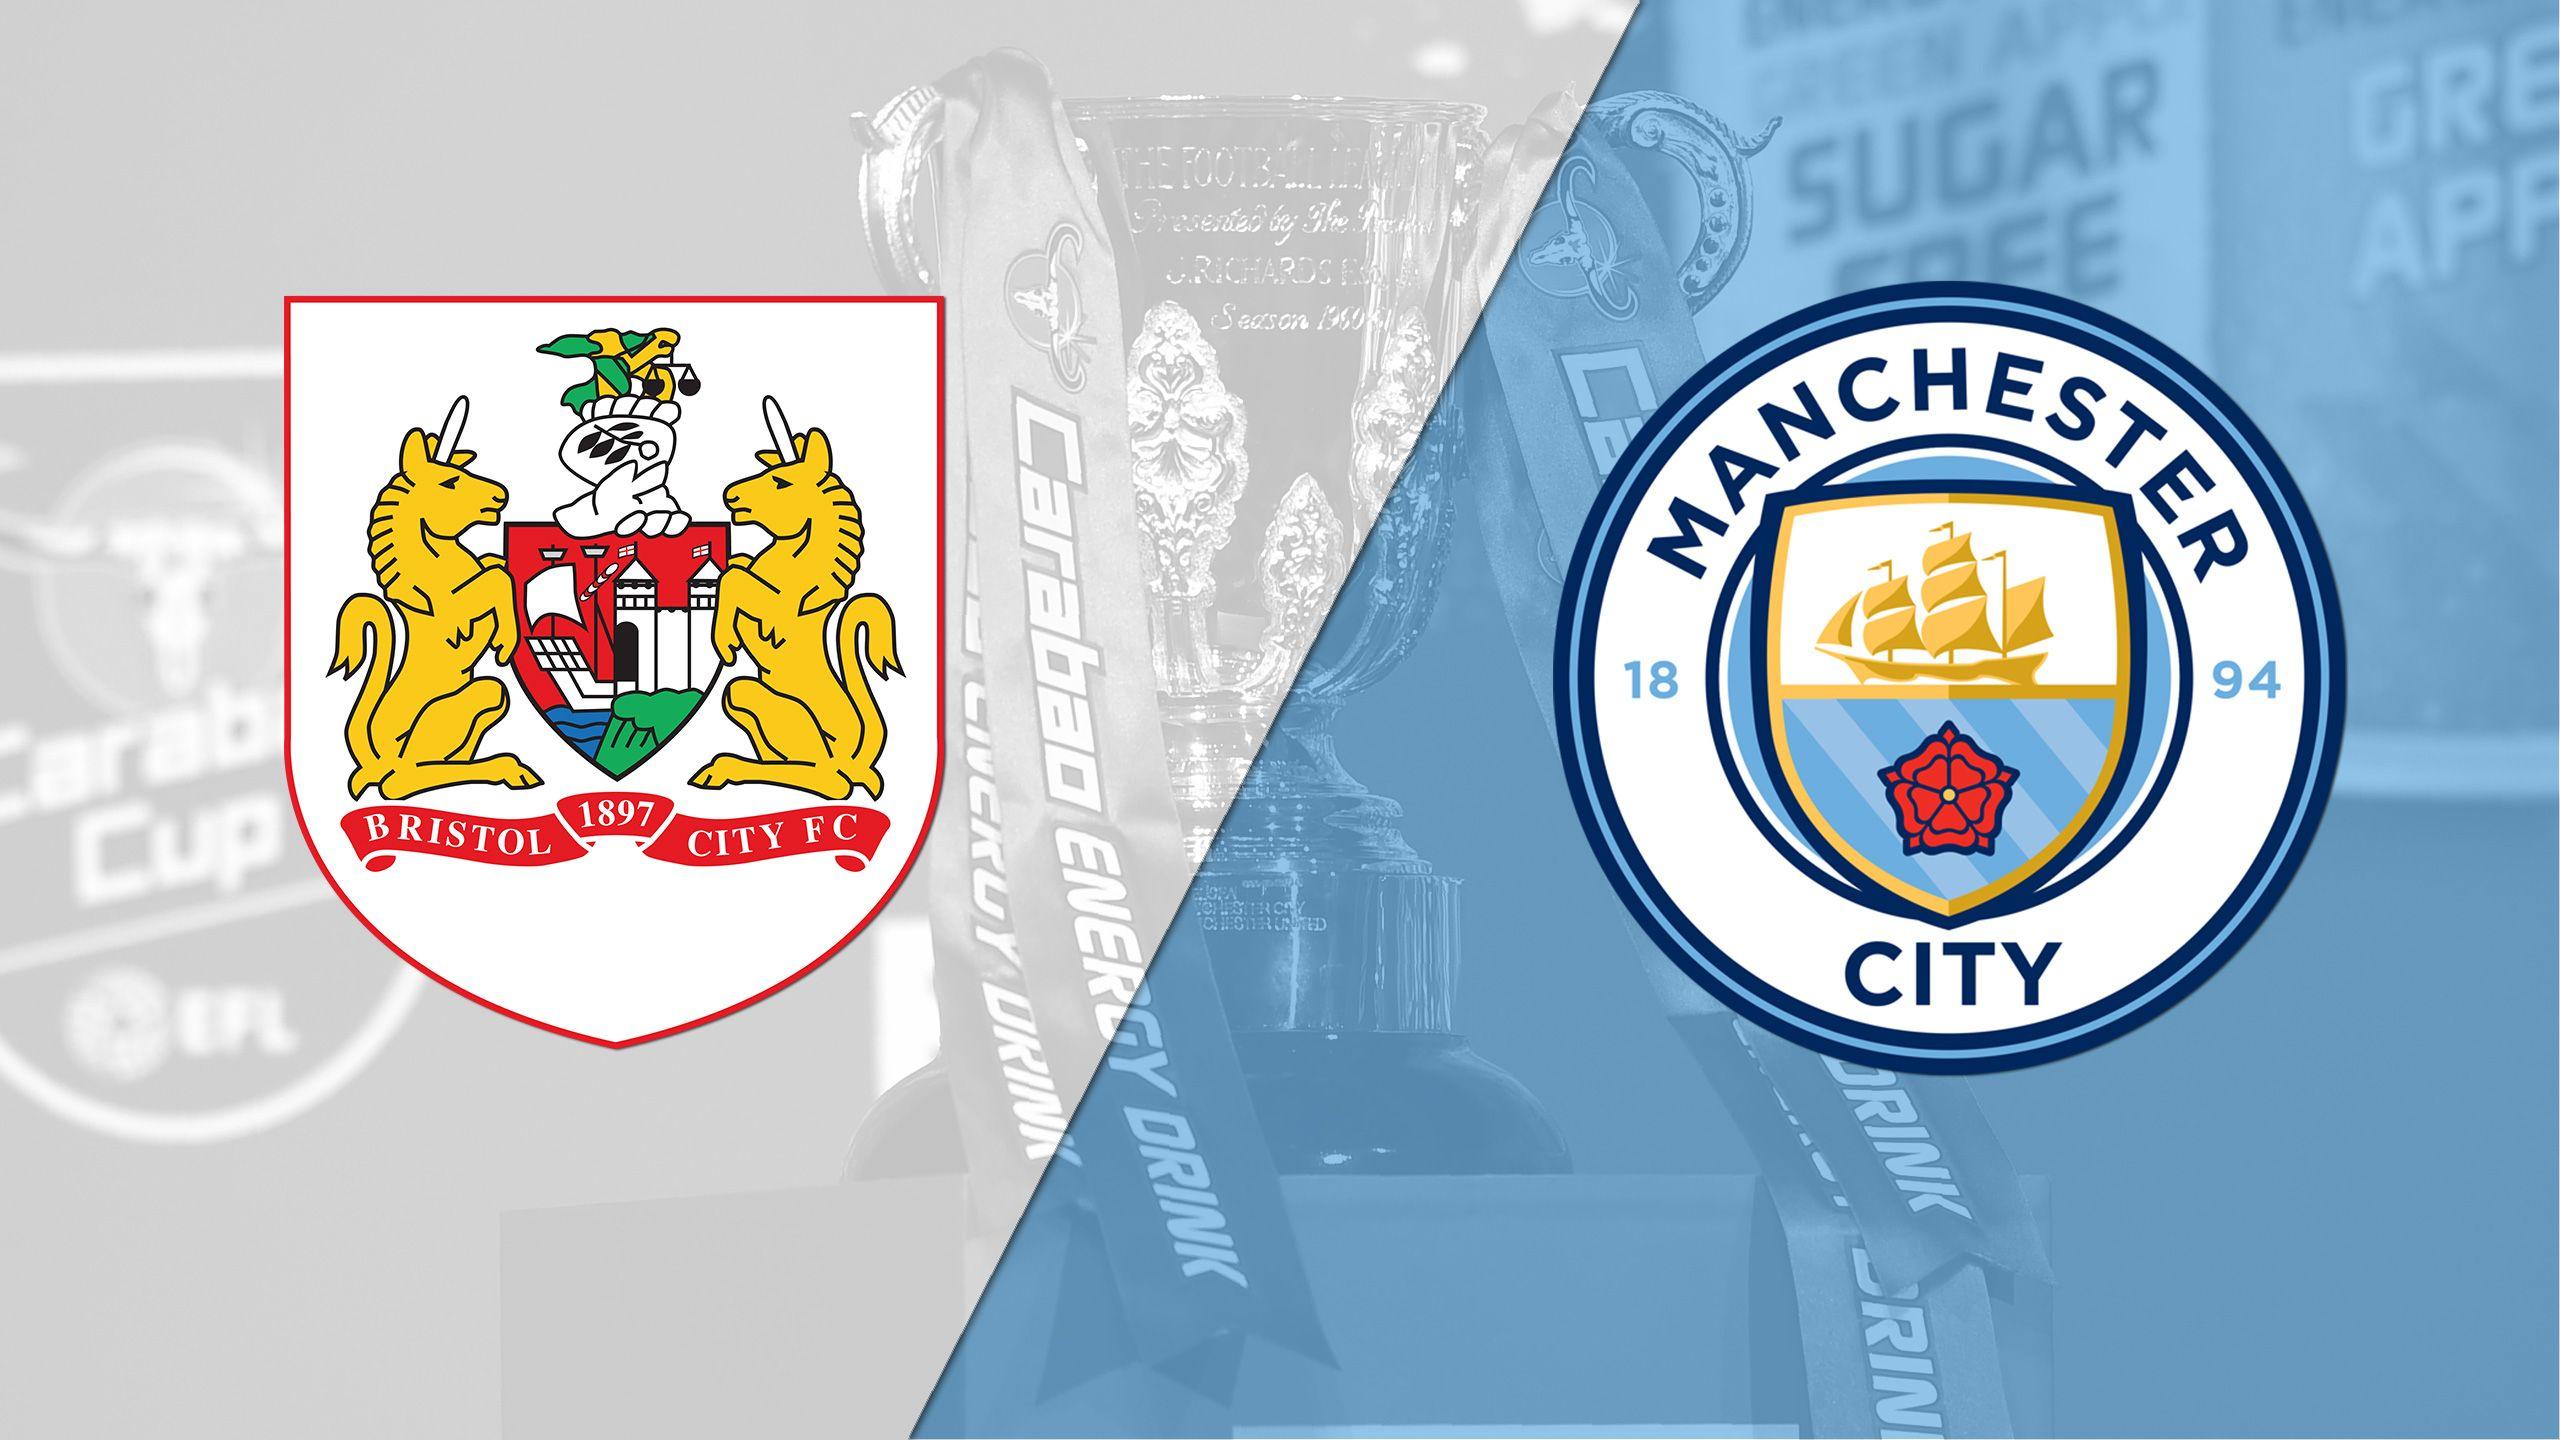 Bristol City vs. Manchester City (Semi Finals - Leg 2) (Carabo Cup)